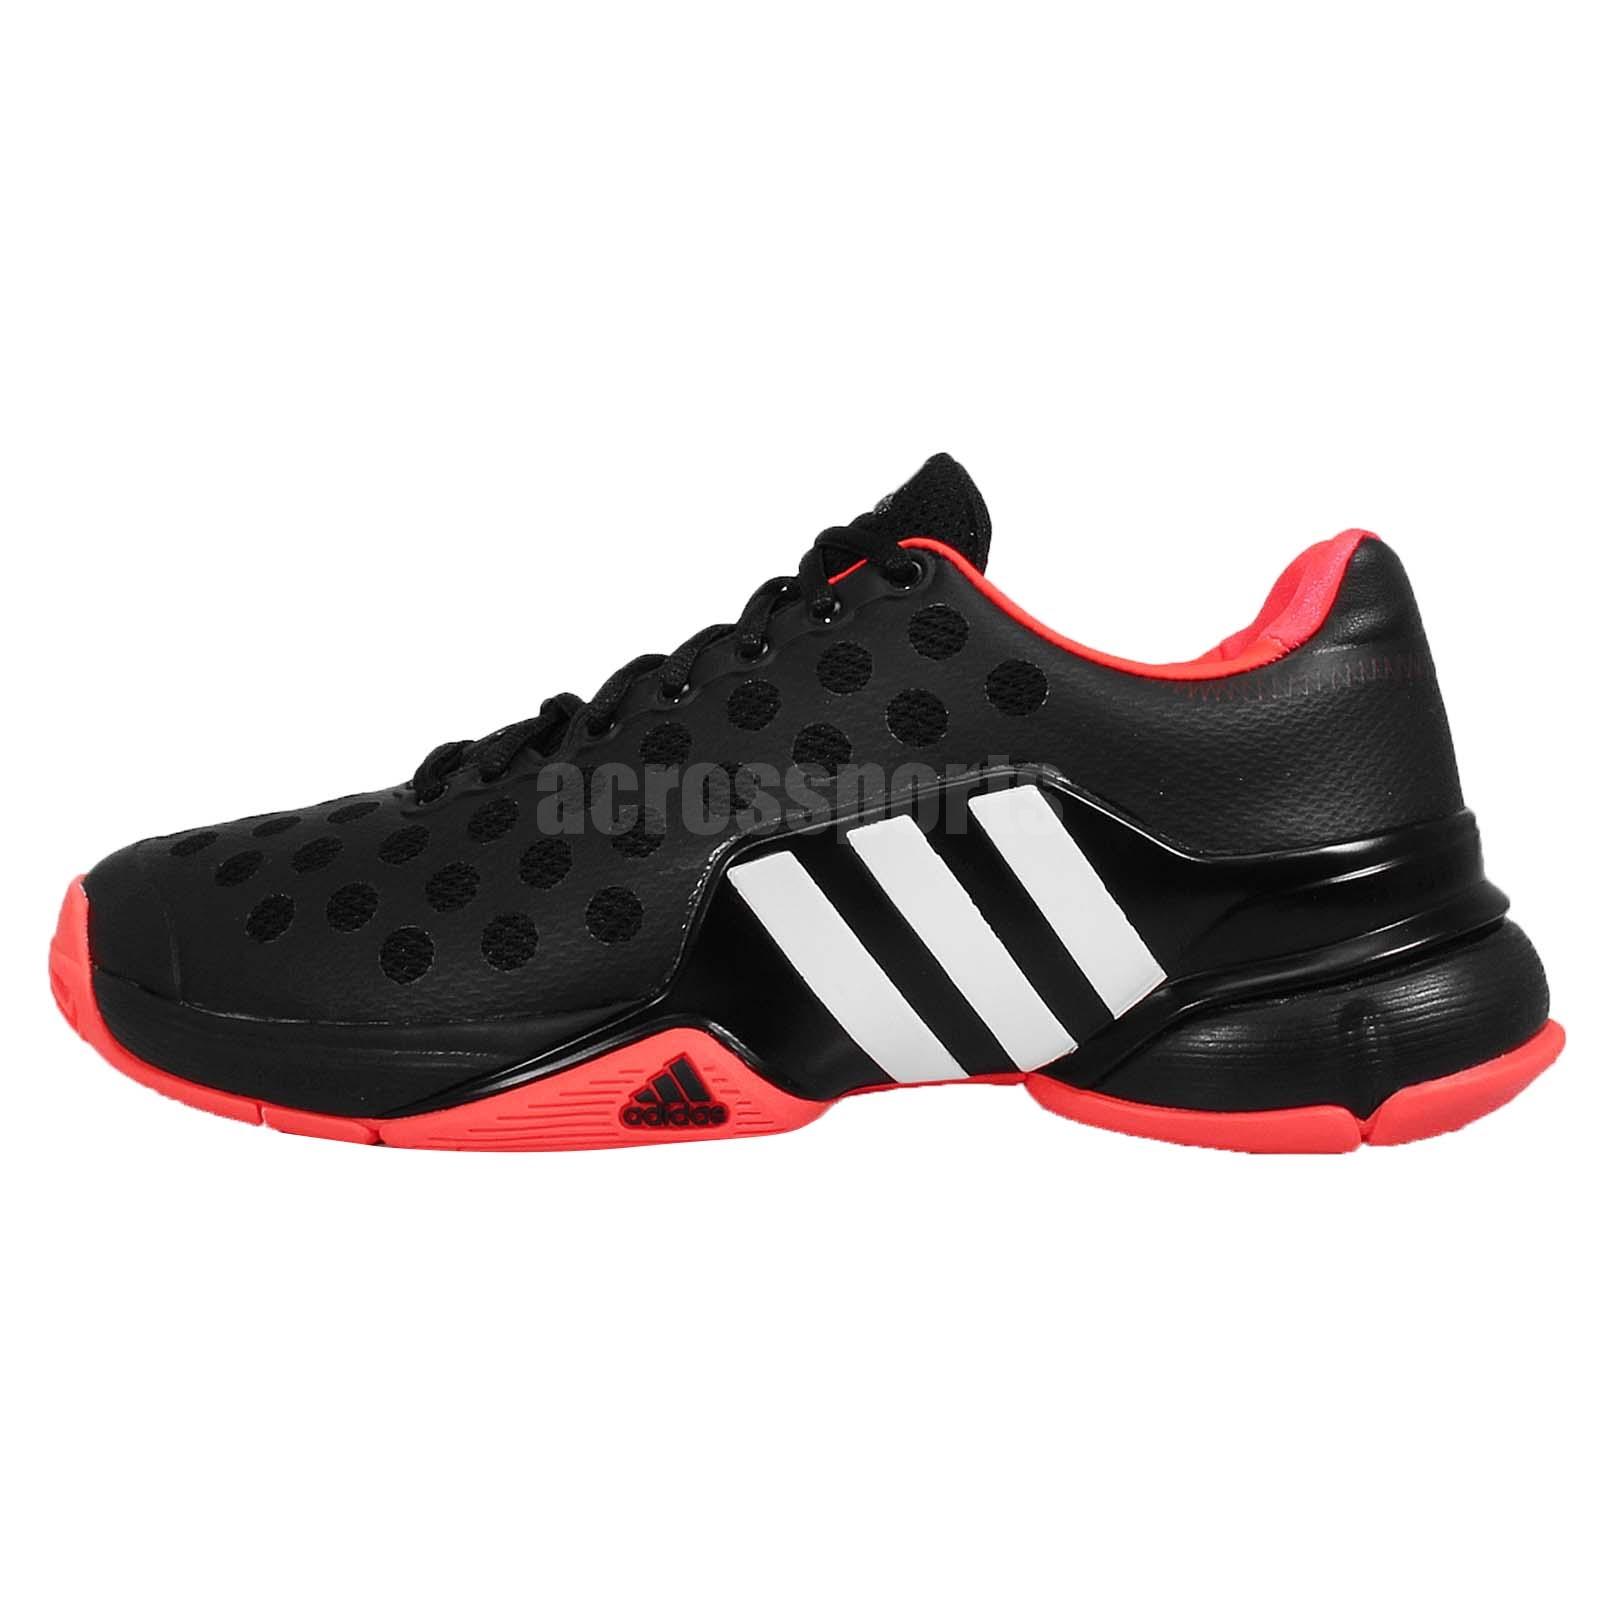 adidas barricade 2015 black white mens tennis shoes